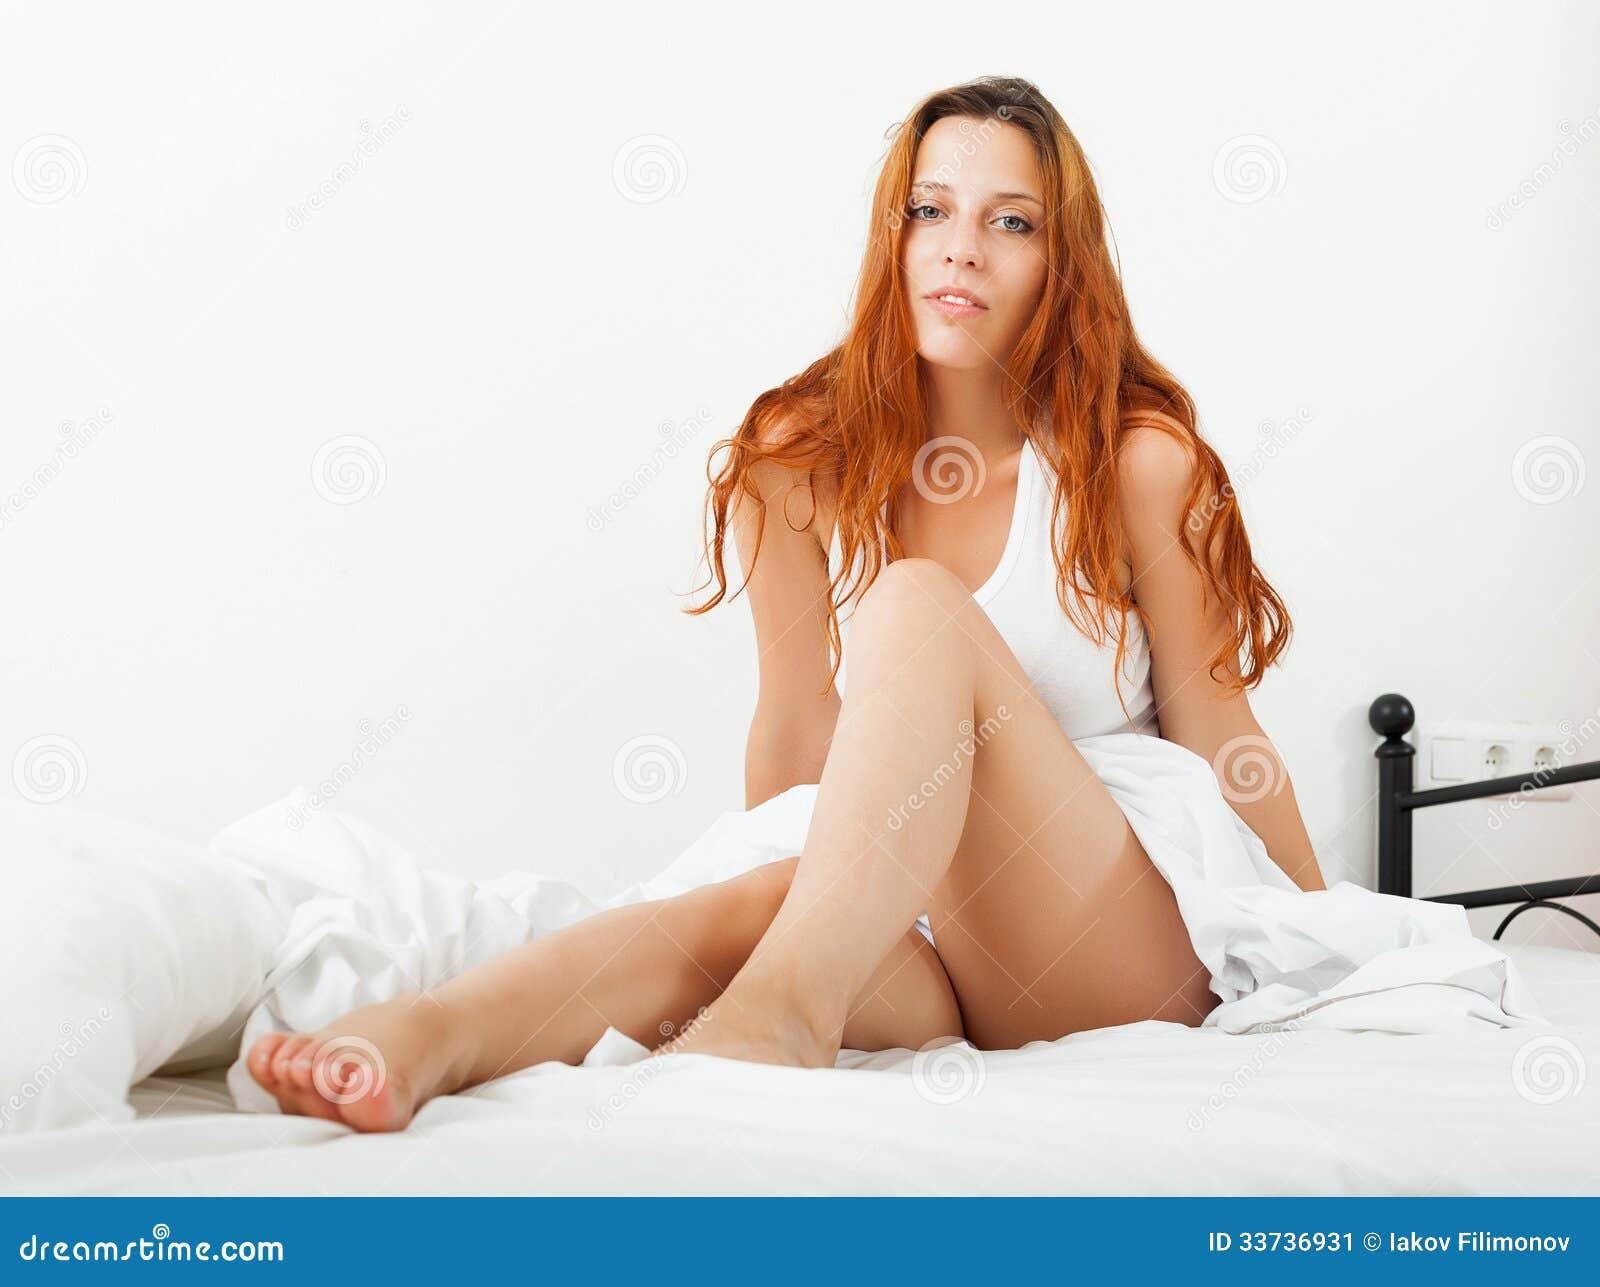 Женщина лежа на белых листах на кровати дома